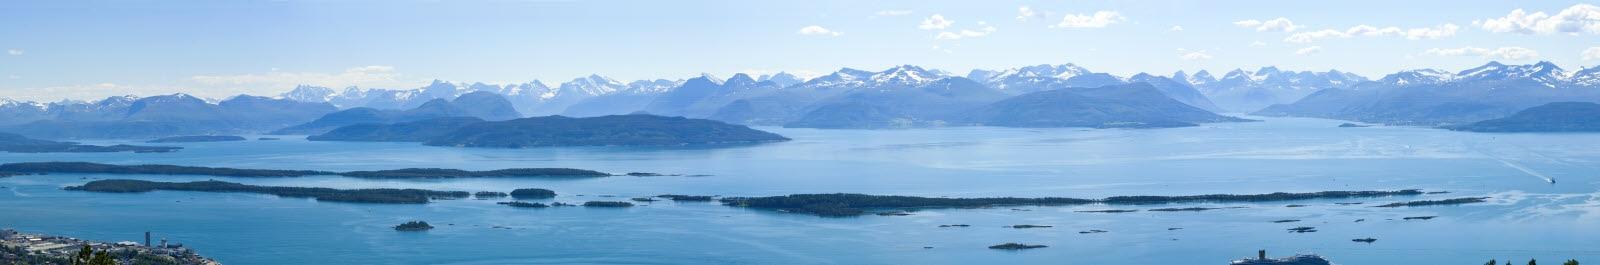 Scandic-Seilet-exterior-panorama-view.jpg